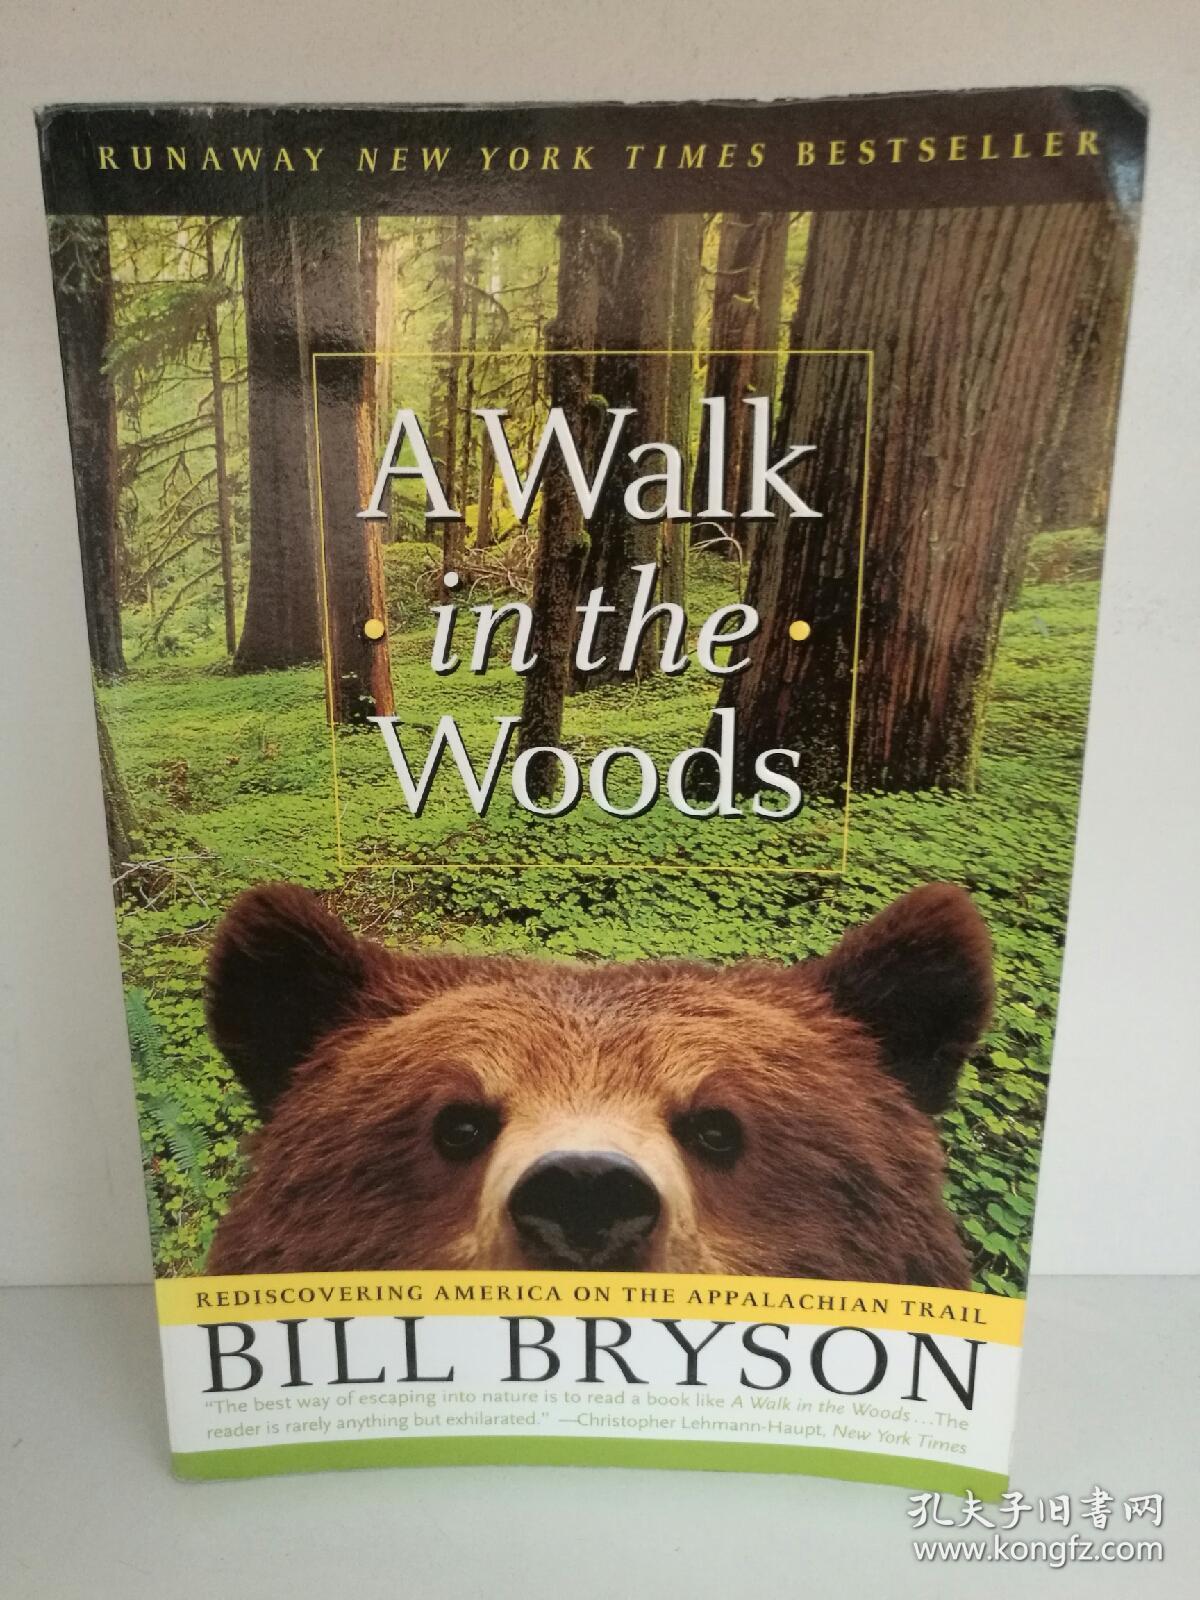 比尔·布莱森 Bill Bryson:A Walk in the Woods (Anchor  Books 2007年版)英文原版书